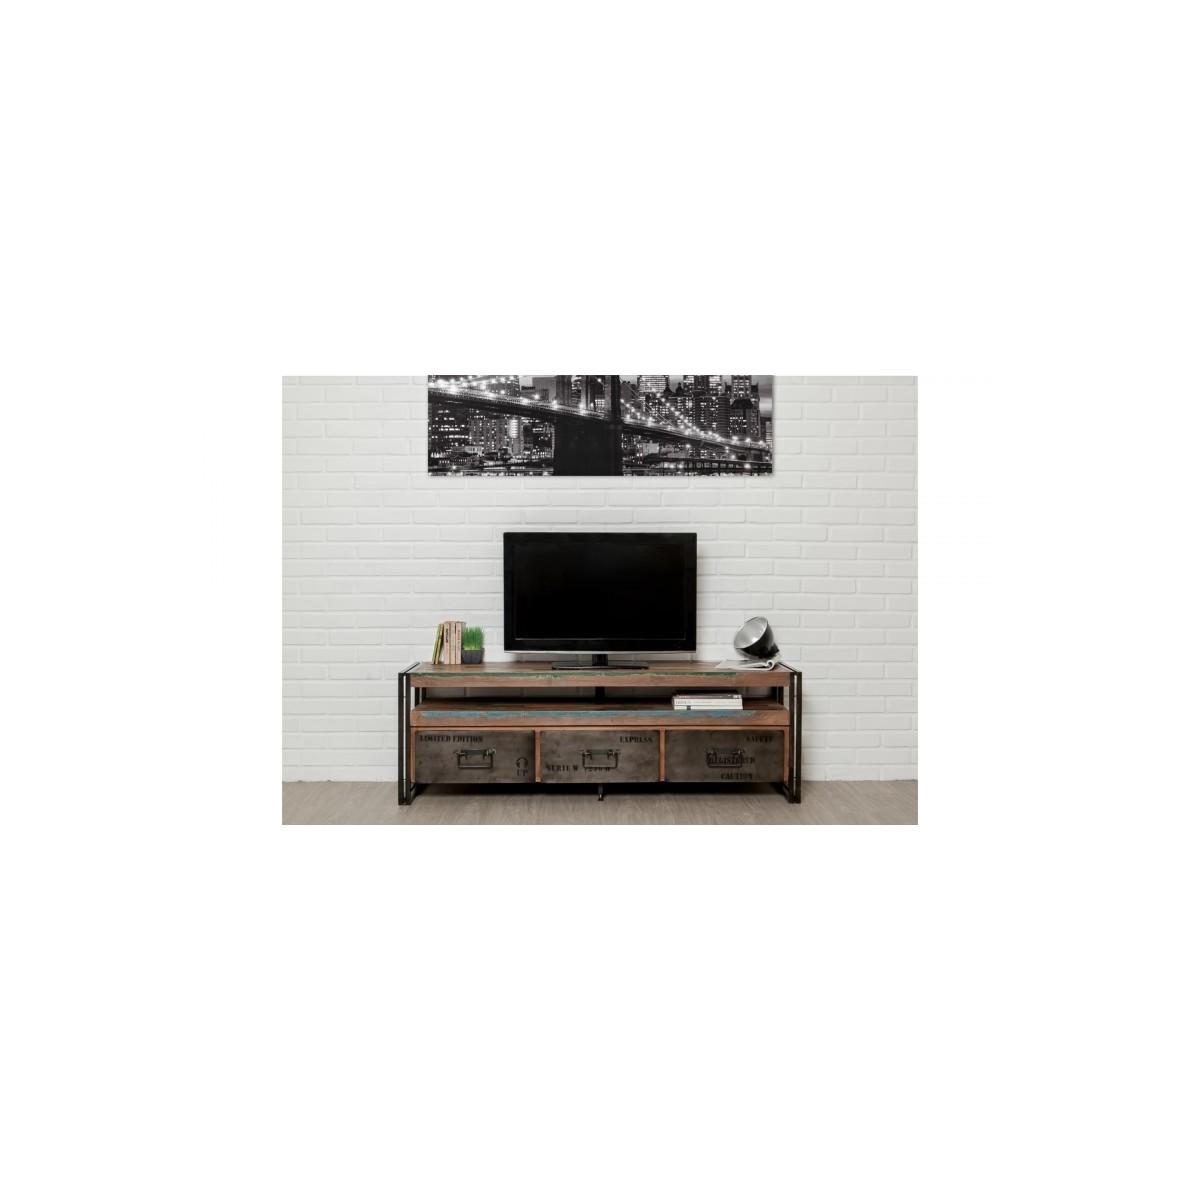 moblierte 3 schubladen 1 niedrige tv nische 160 cm noah massiven teak recycelt industrie und metall amp story 5420